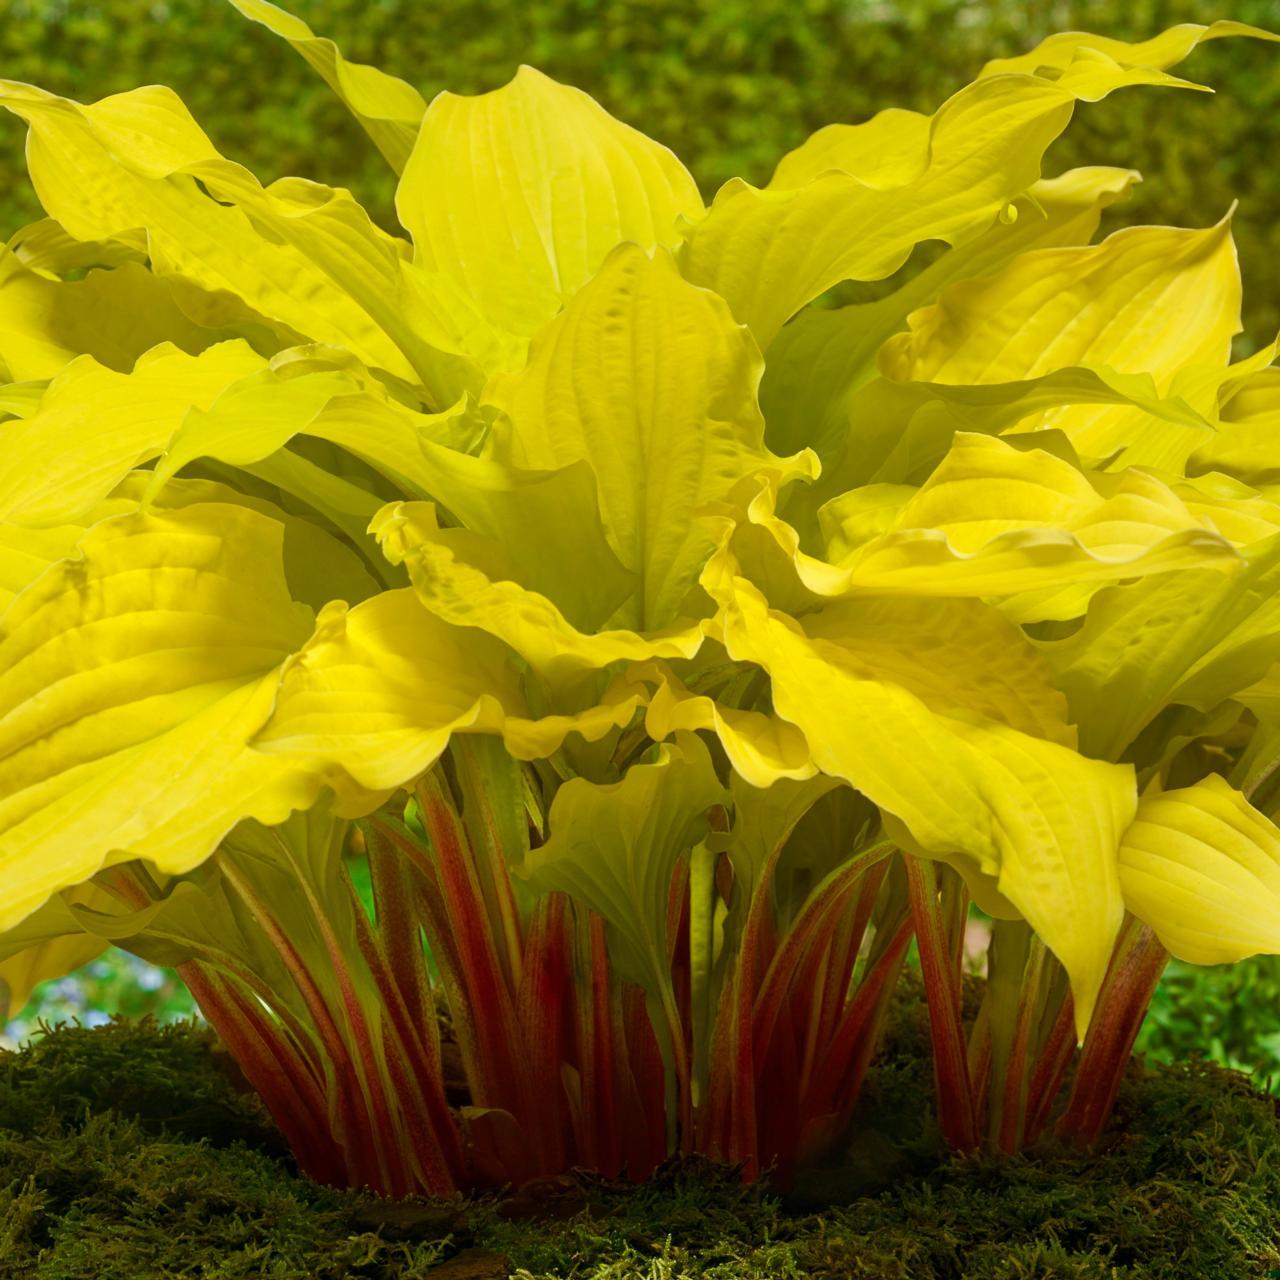 Hosta 'Lipstick Blonde' plant